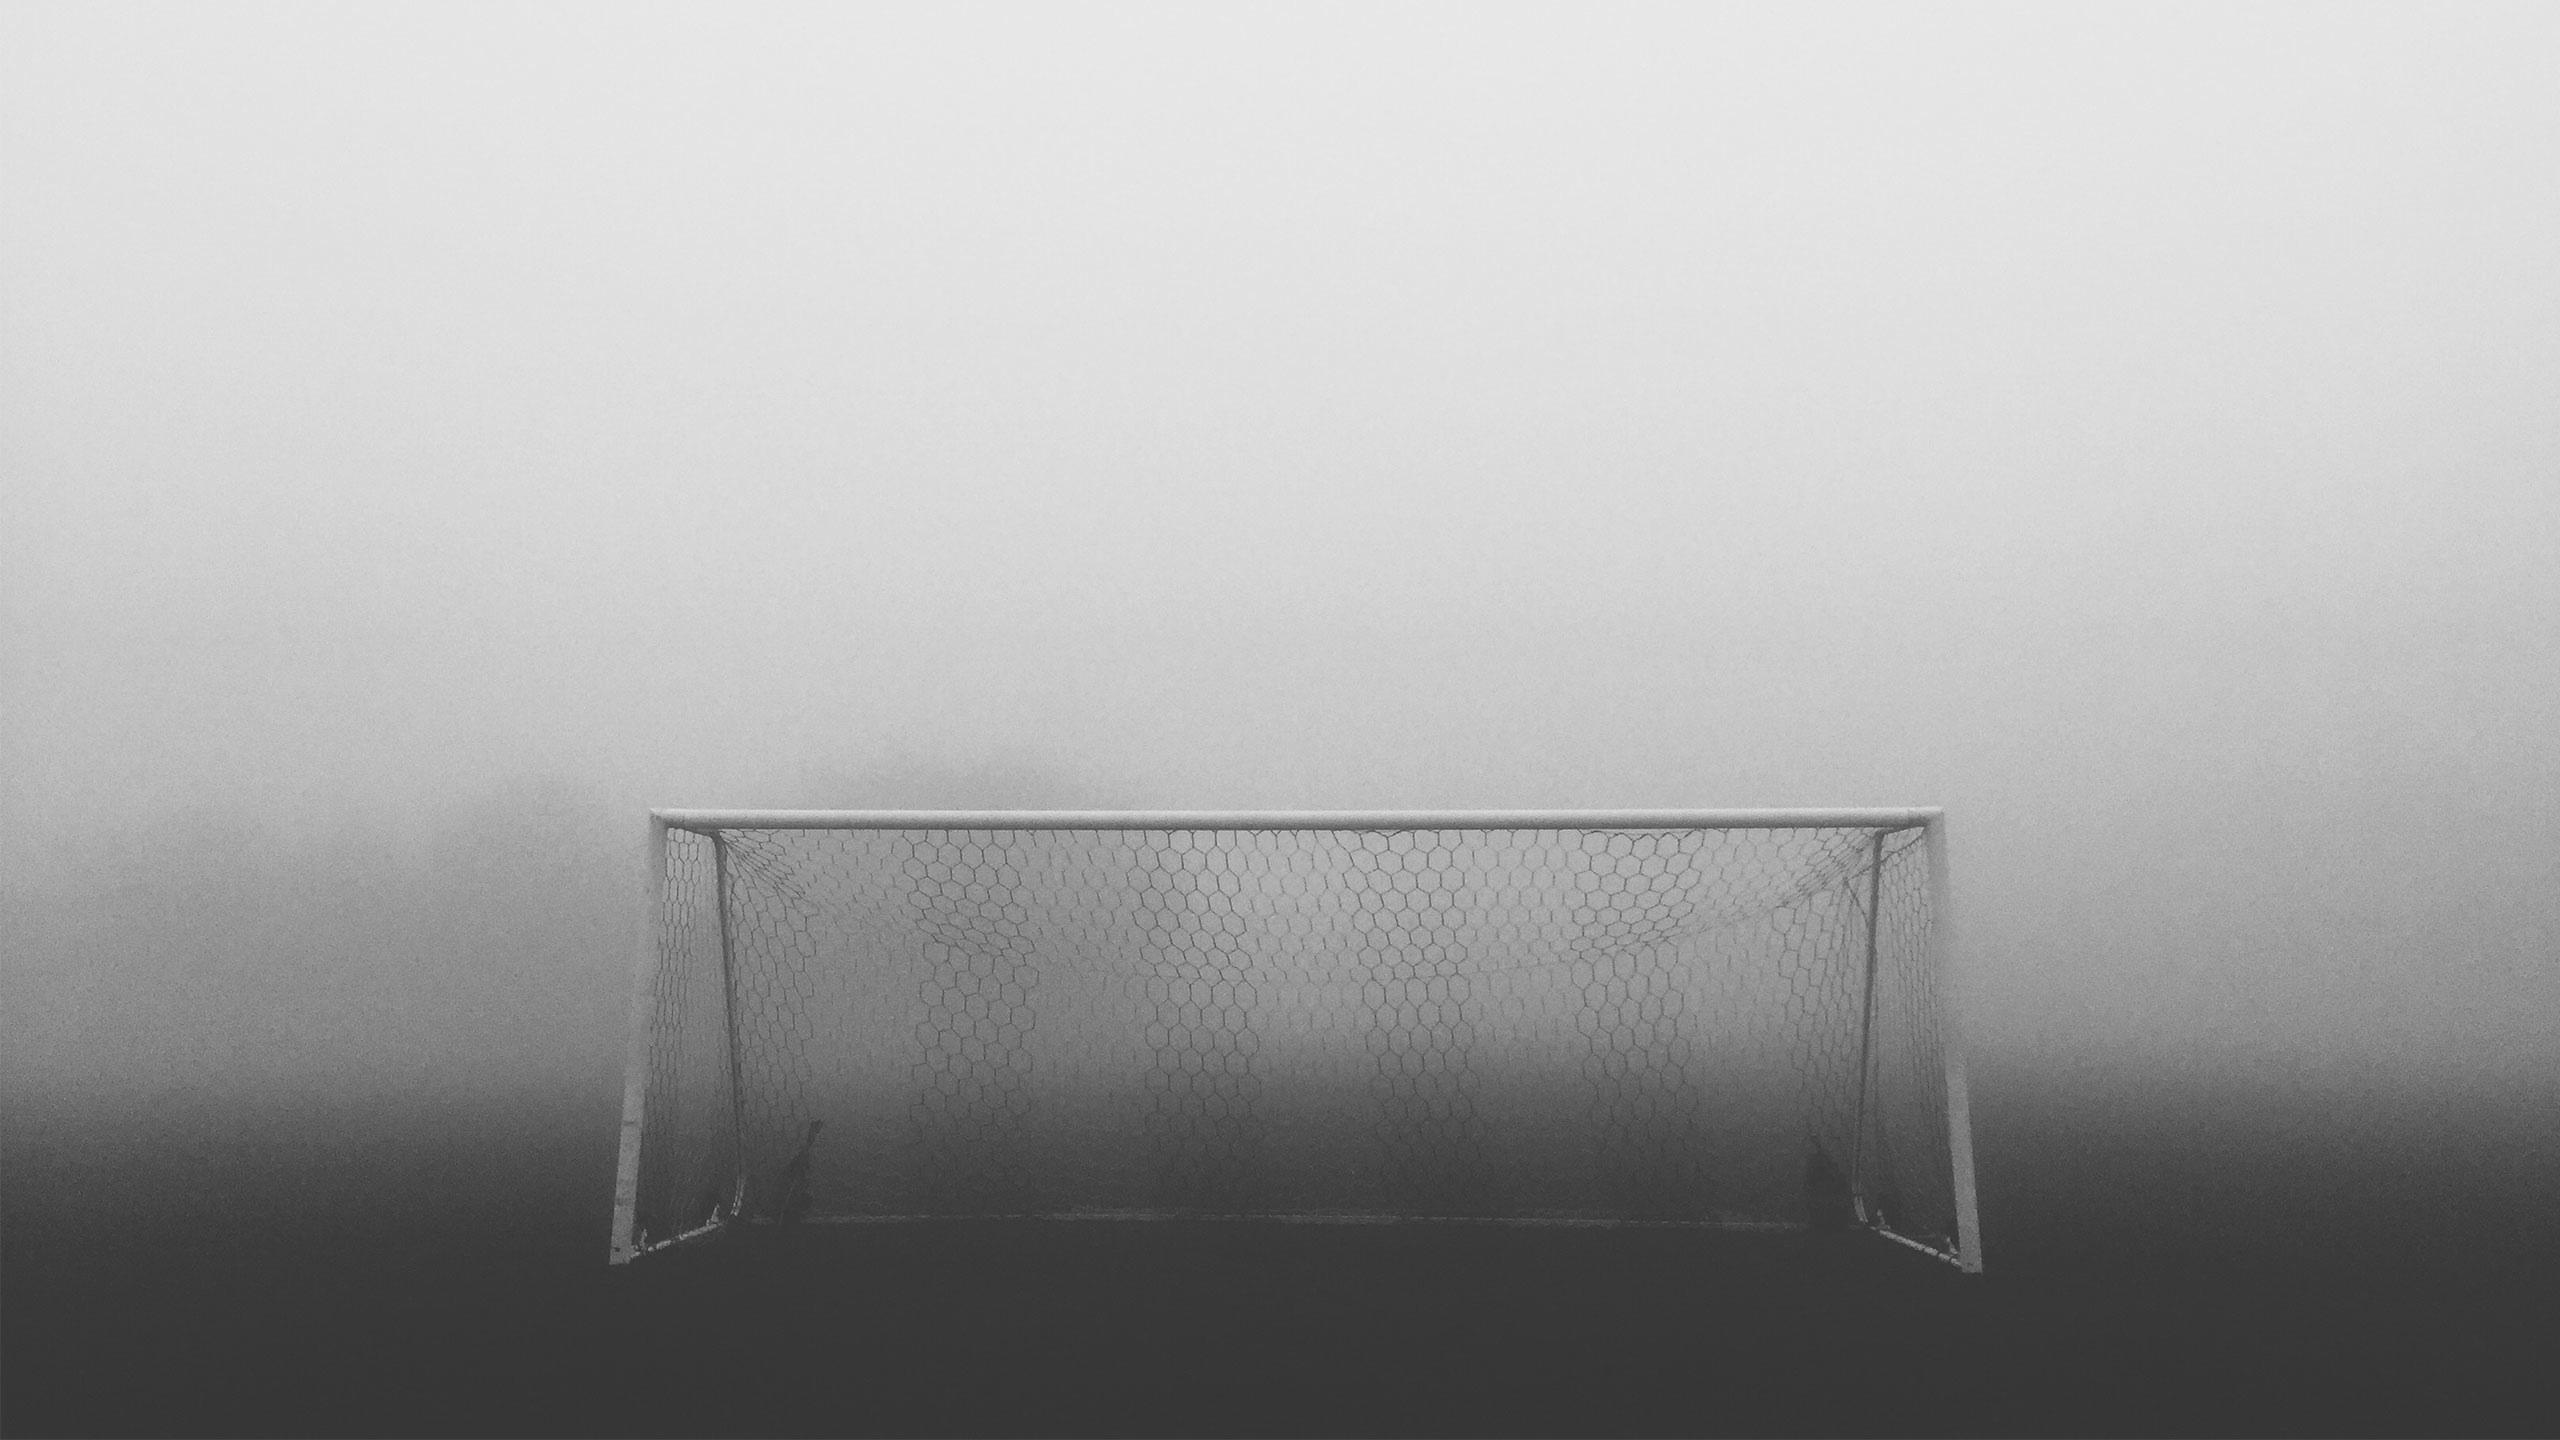 Football goal, black and white photo.